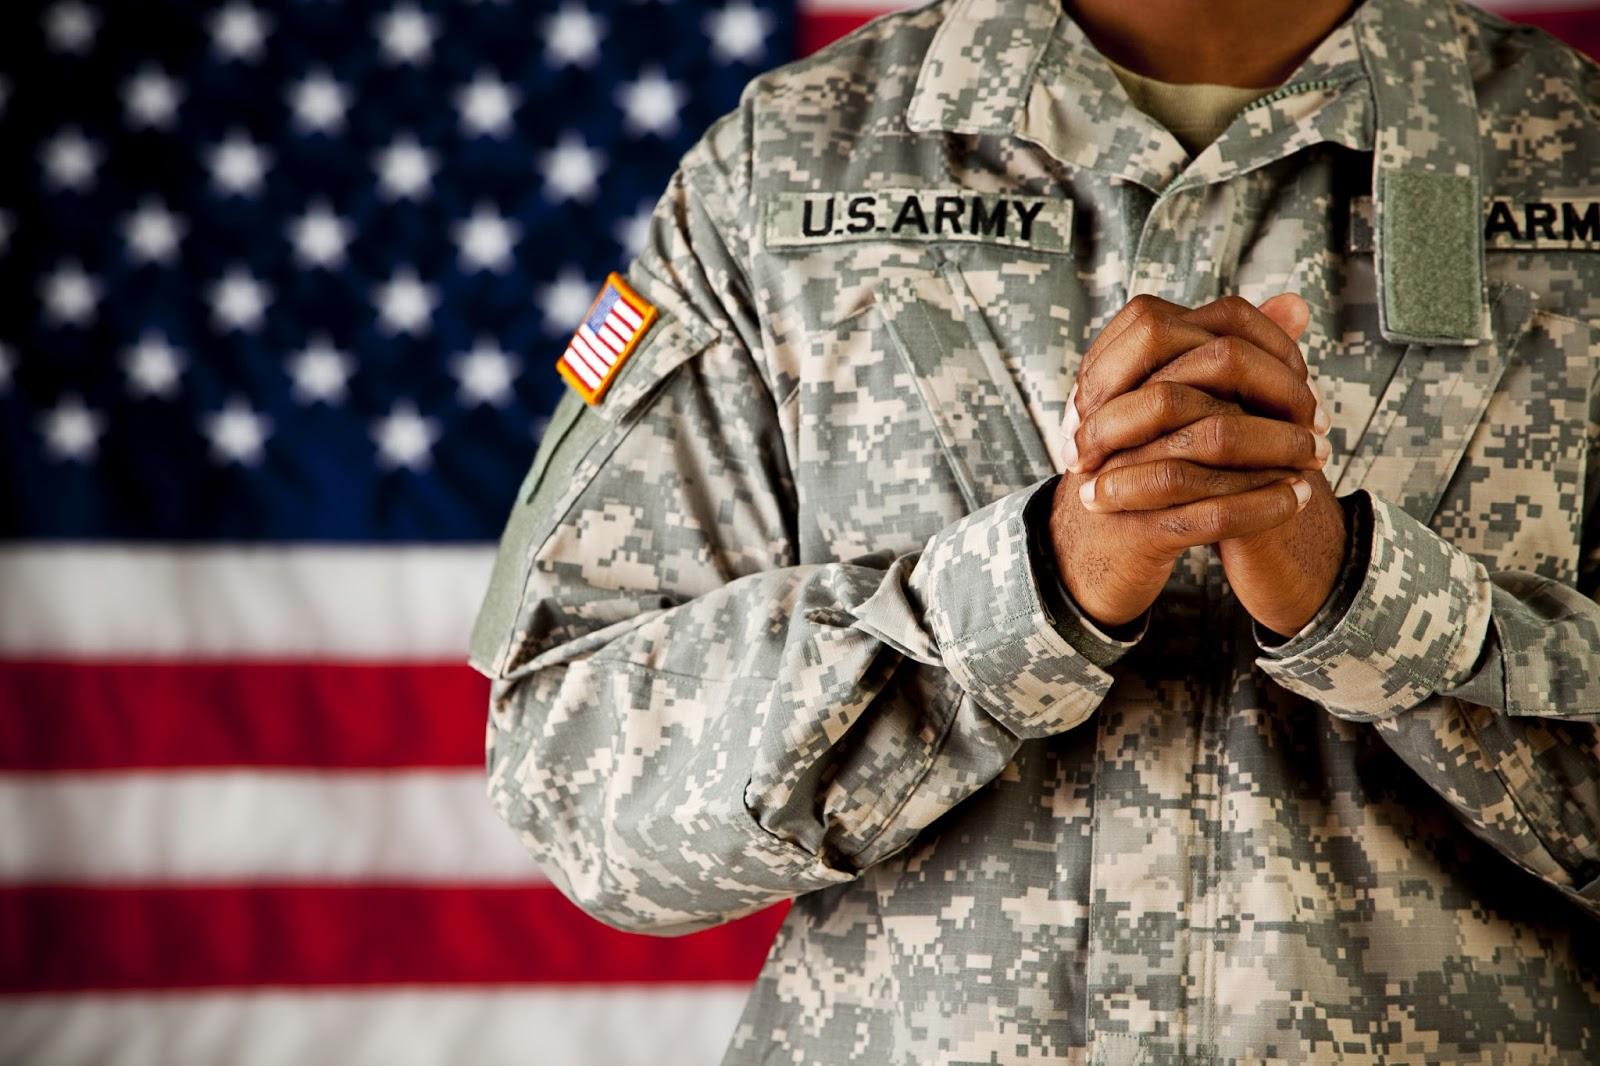 http://www.jesusmi.org/wp-content/uploads/2017/02/support-troops-13.jpg